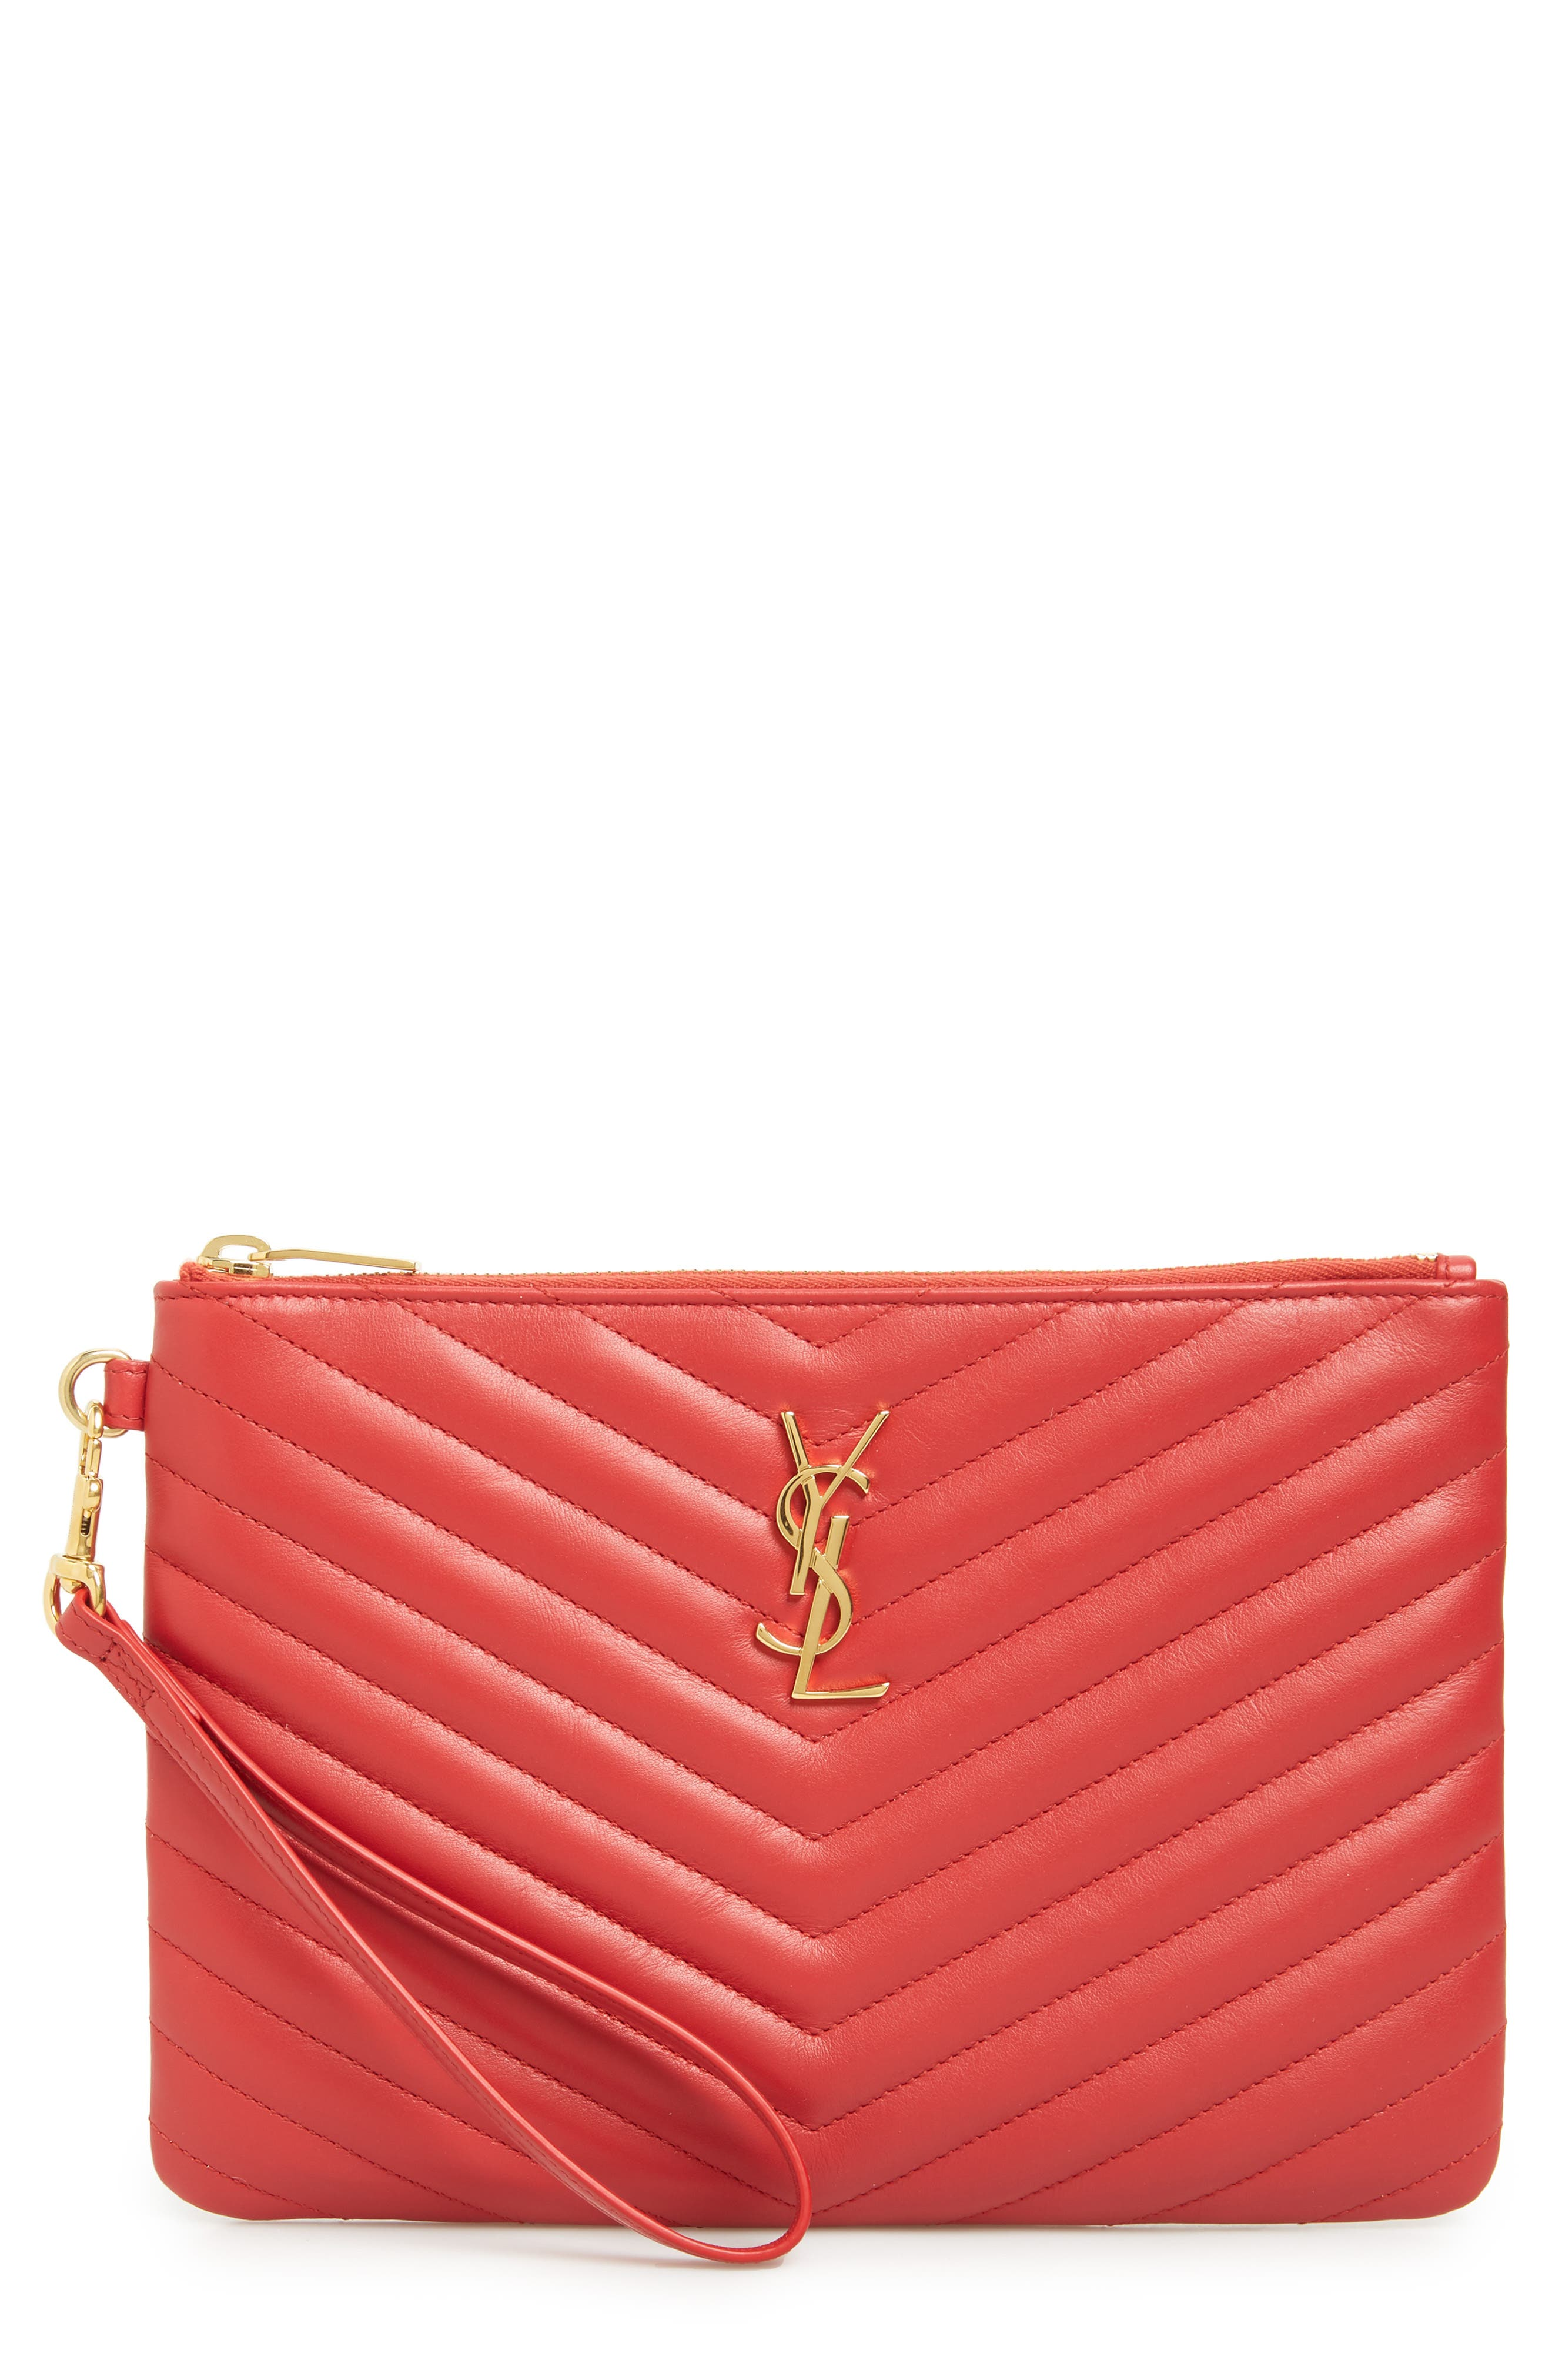 SAINT LAURENT 'Small Monogram' Print Leather Wristlet, Main, color, BANDANA RED